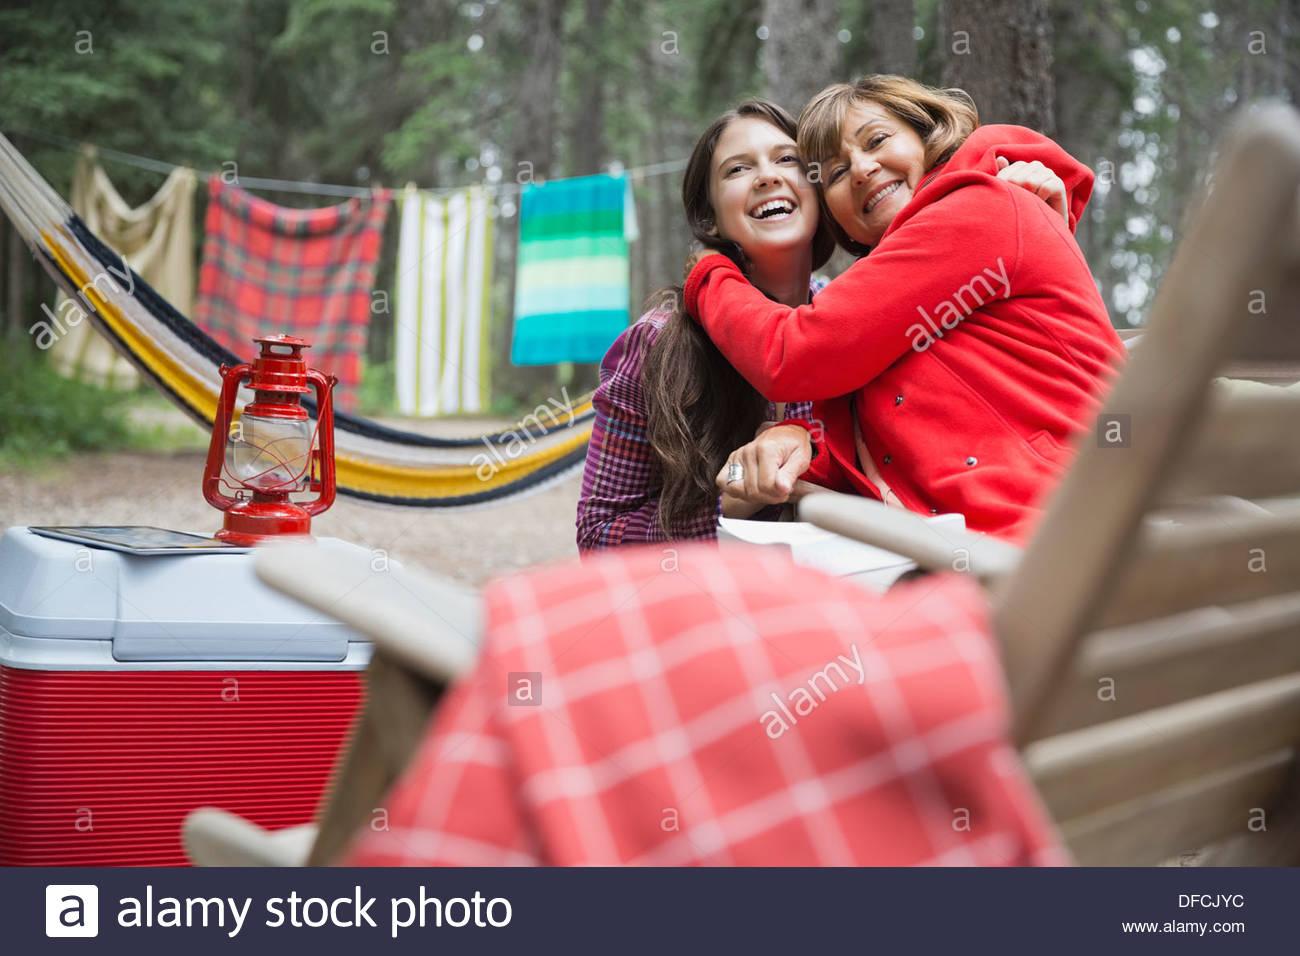 Grand-mère affectueuse et petite-fille de camping Photo Stock